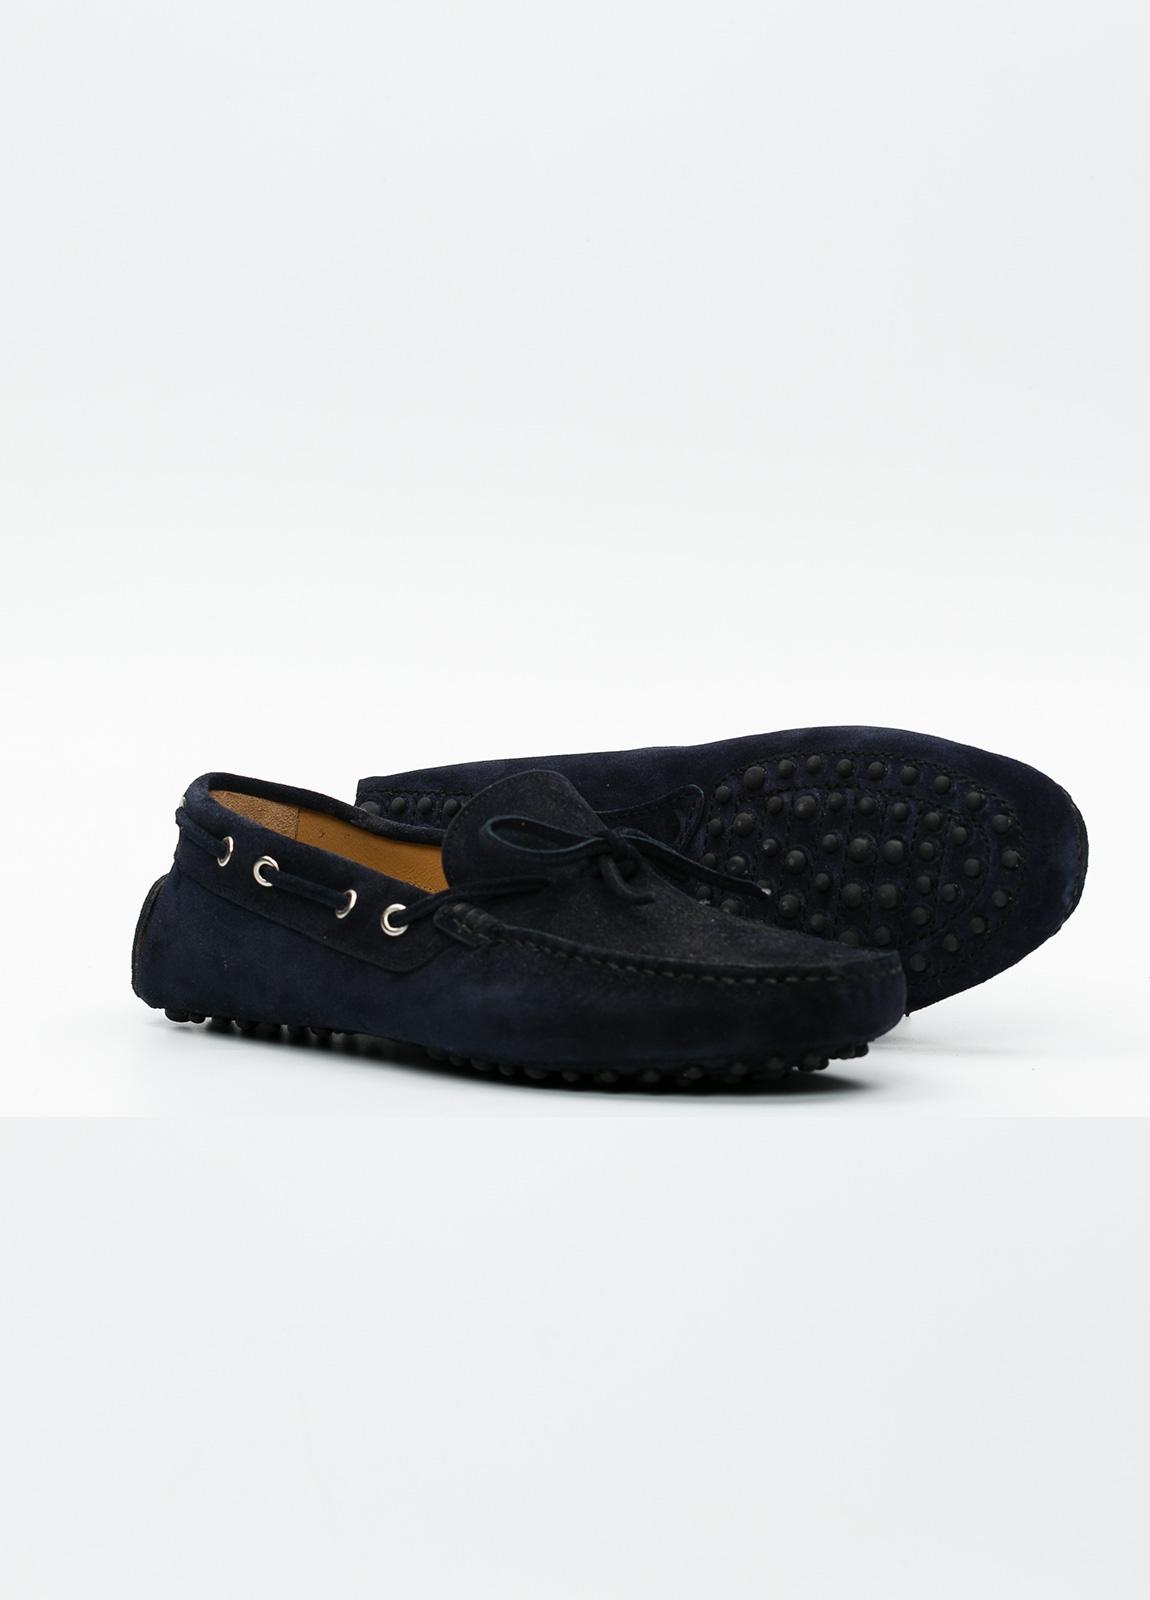 Zapato mocasín Sport color azul marino, 100% Piel. - Ítem5